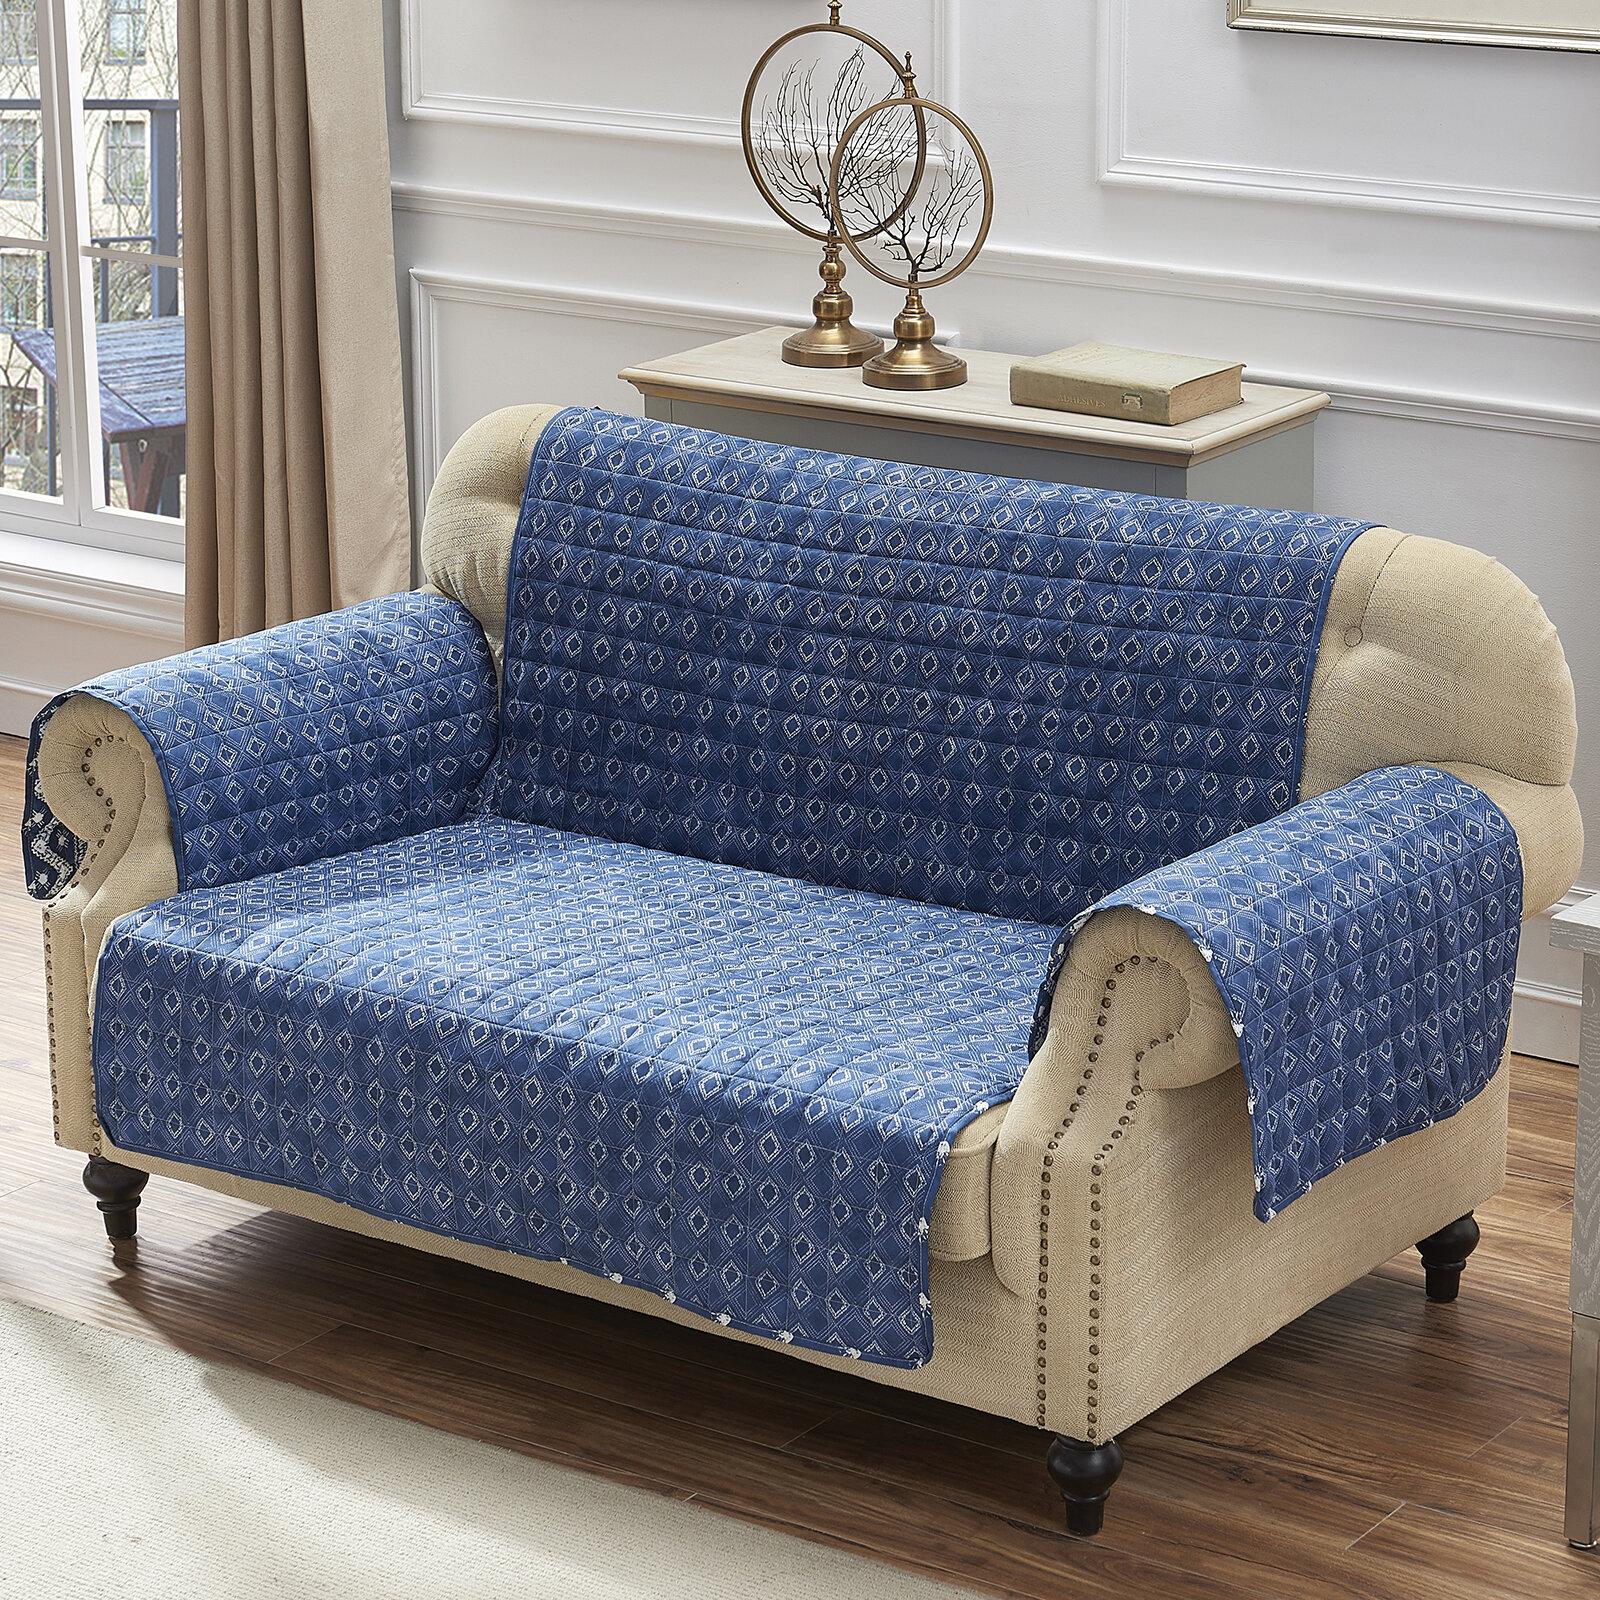 Tremendous T Cushion Loveseat Slipcover Gamerscity Chair Design For Home Gamerscityorg